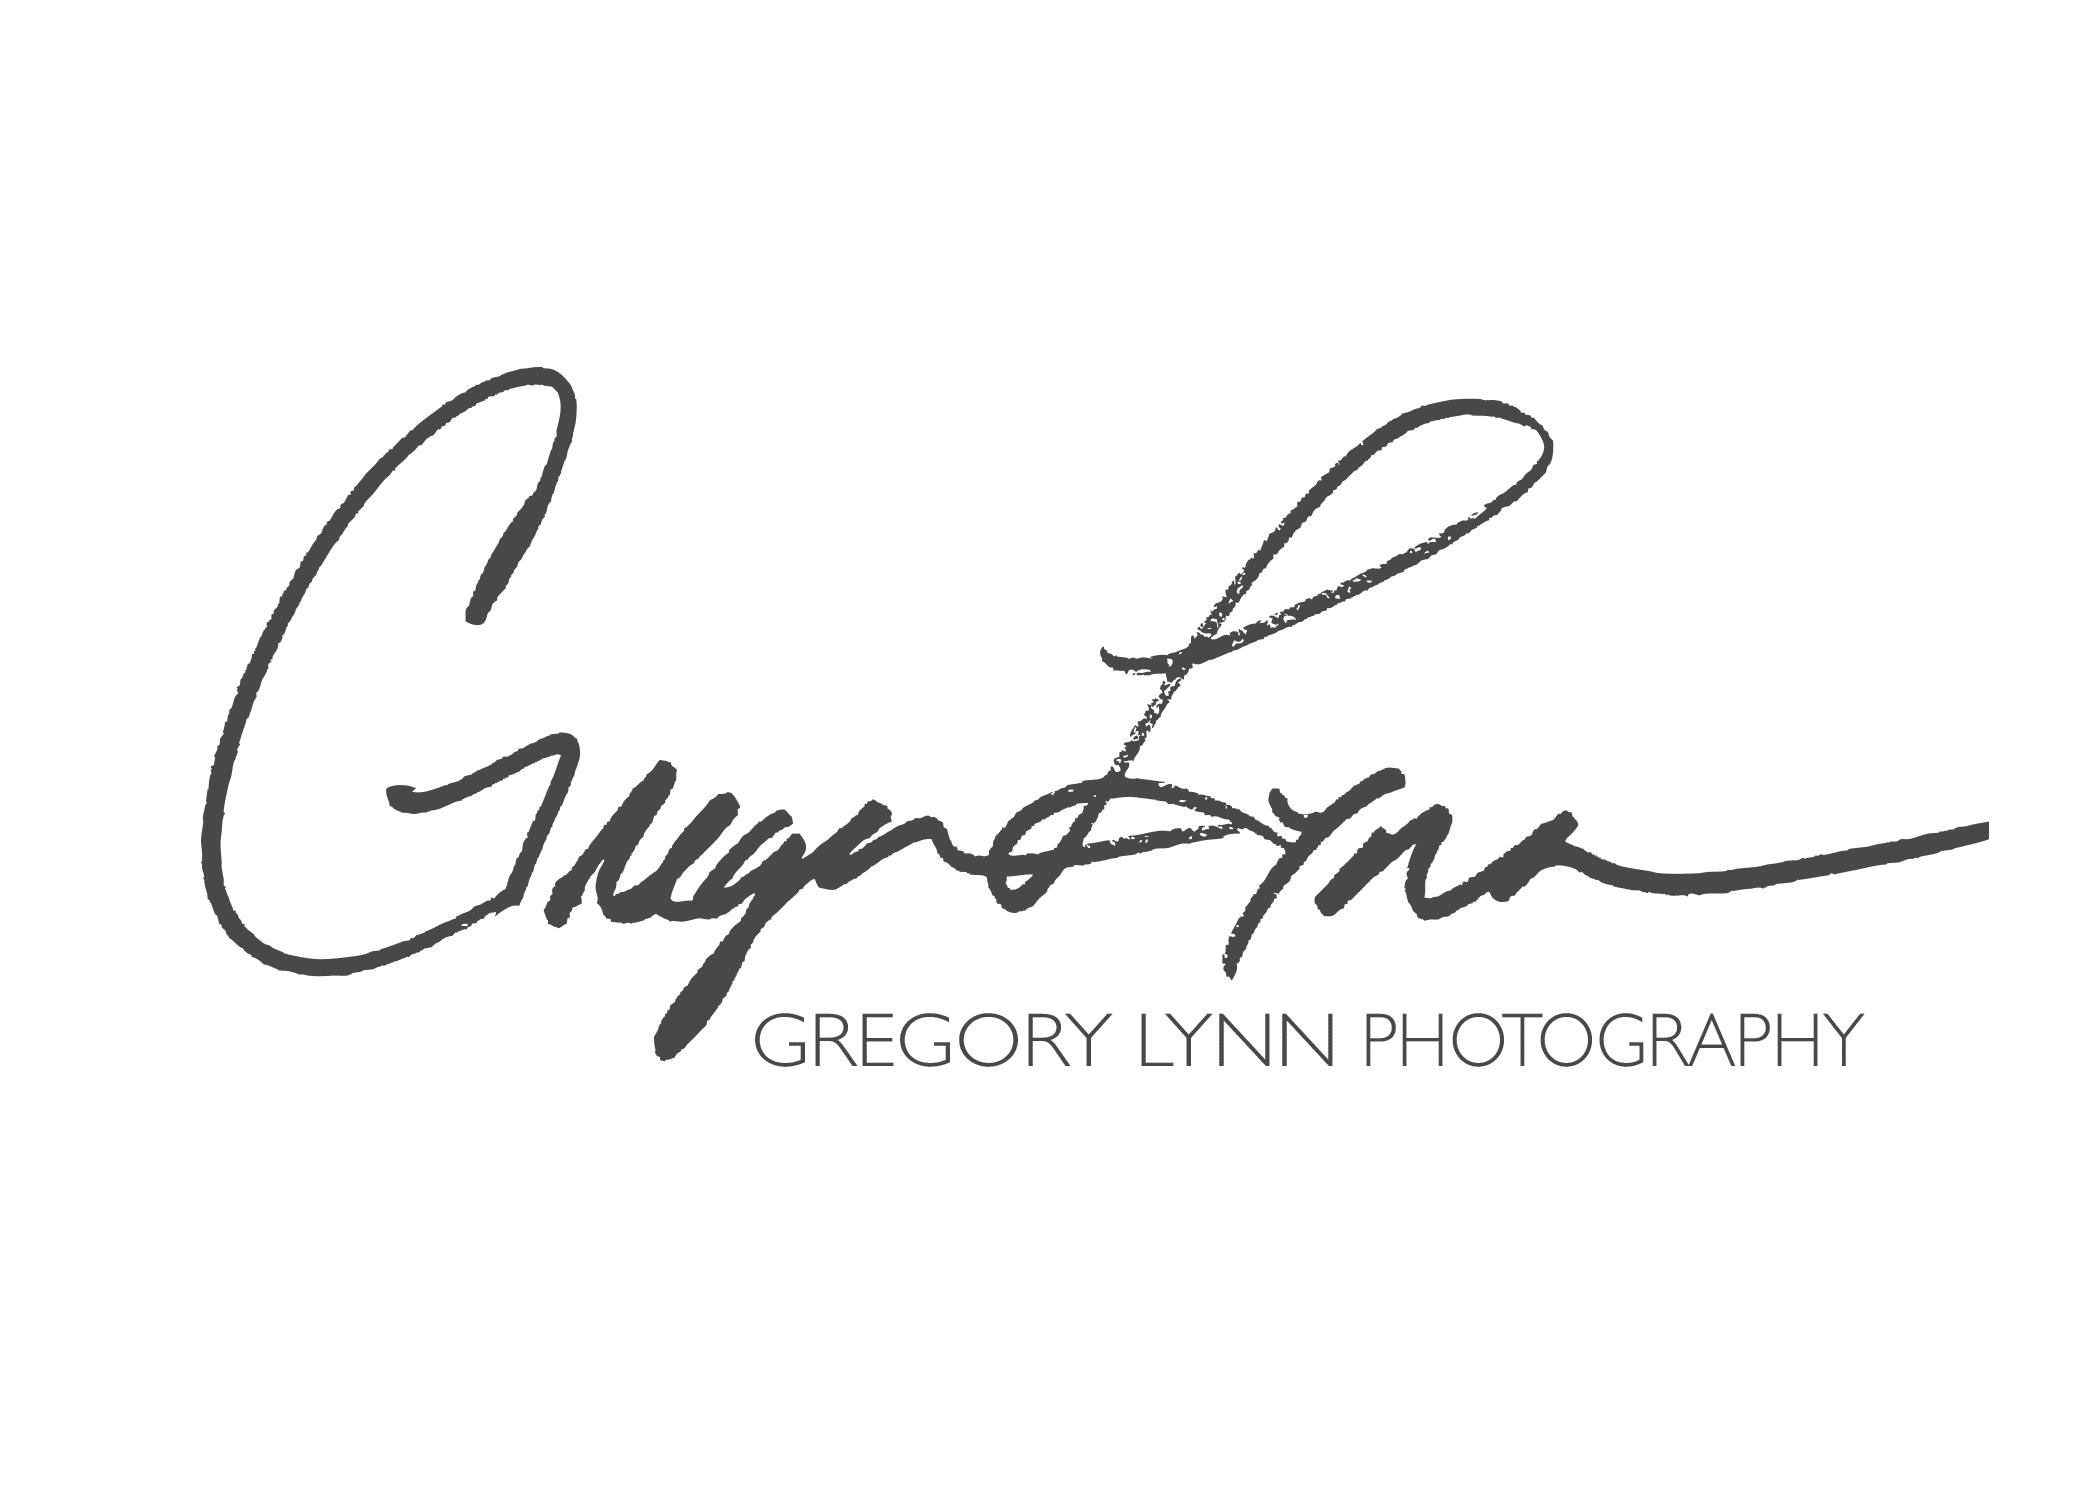 gregorylynnphoto